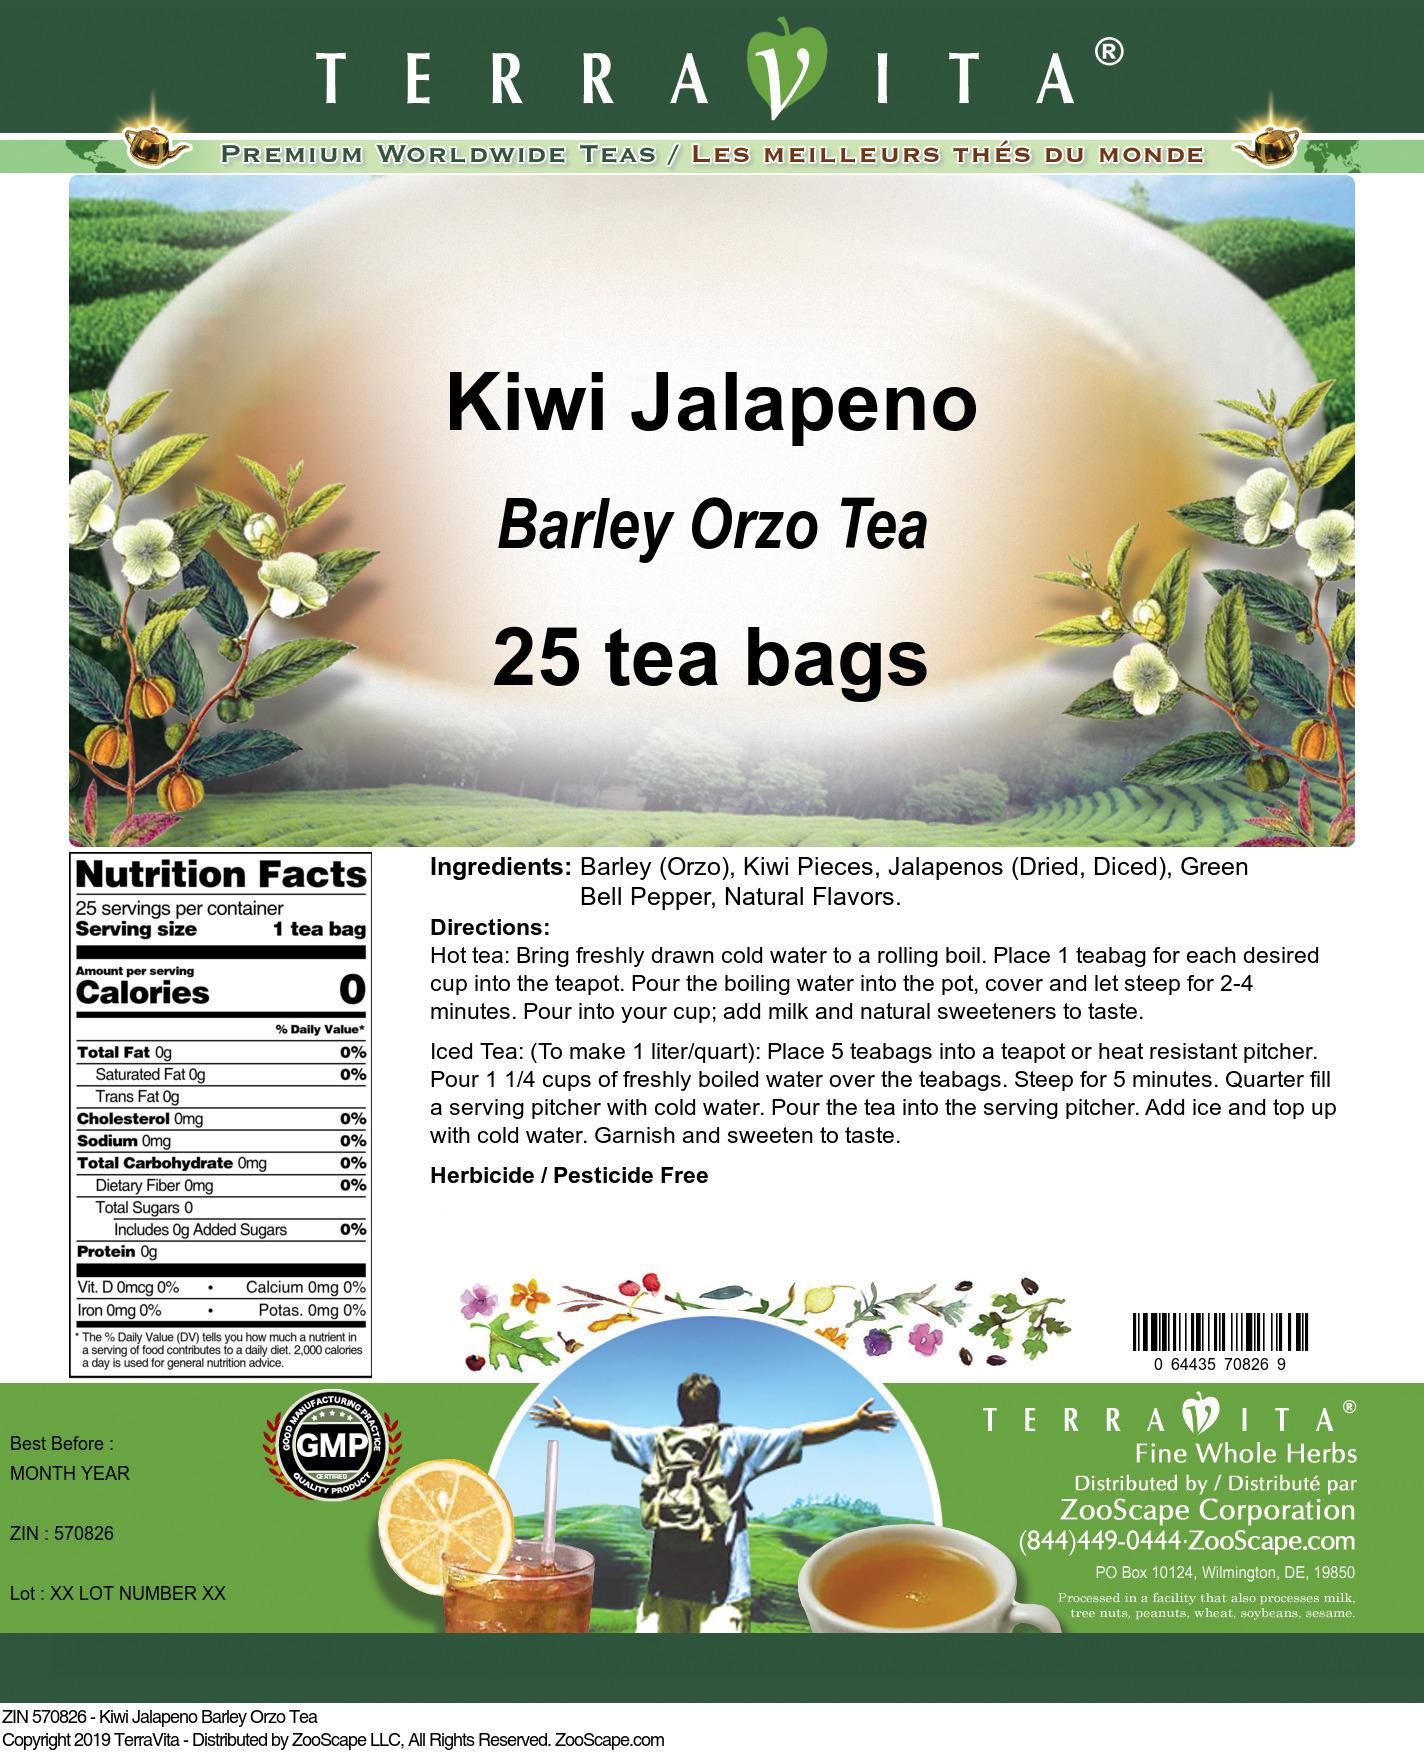 Kiwi Jalapeno Barley Orzo